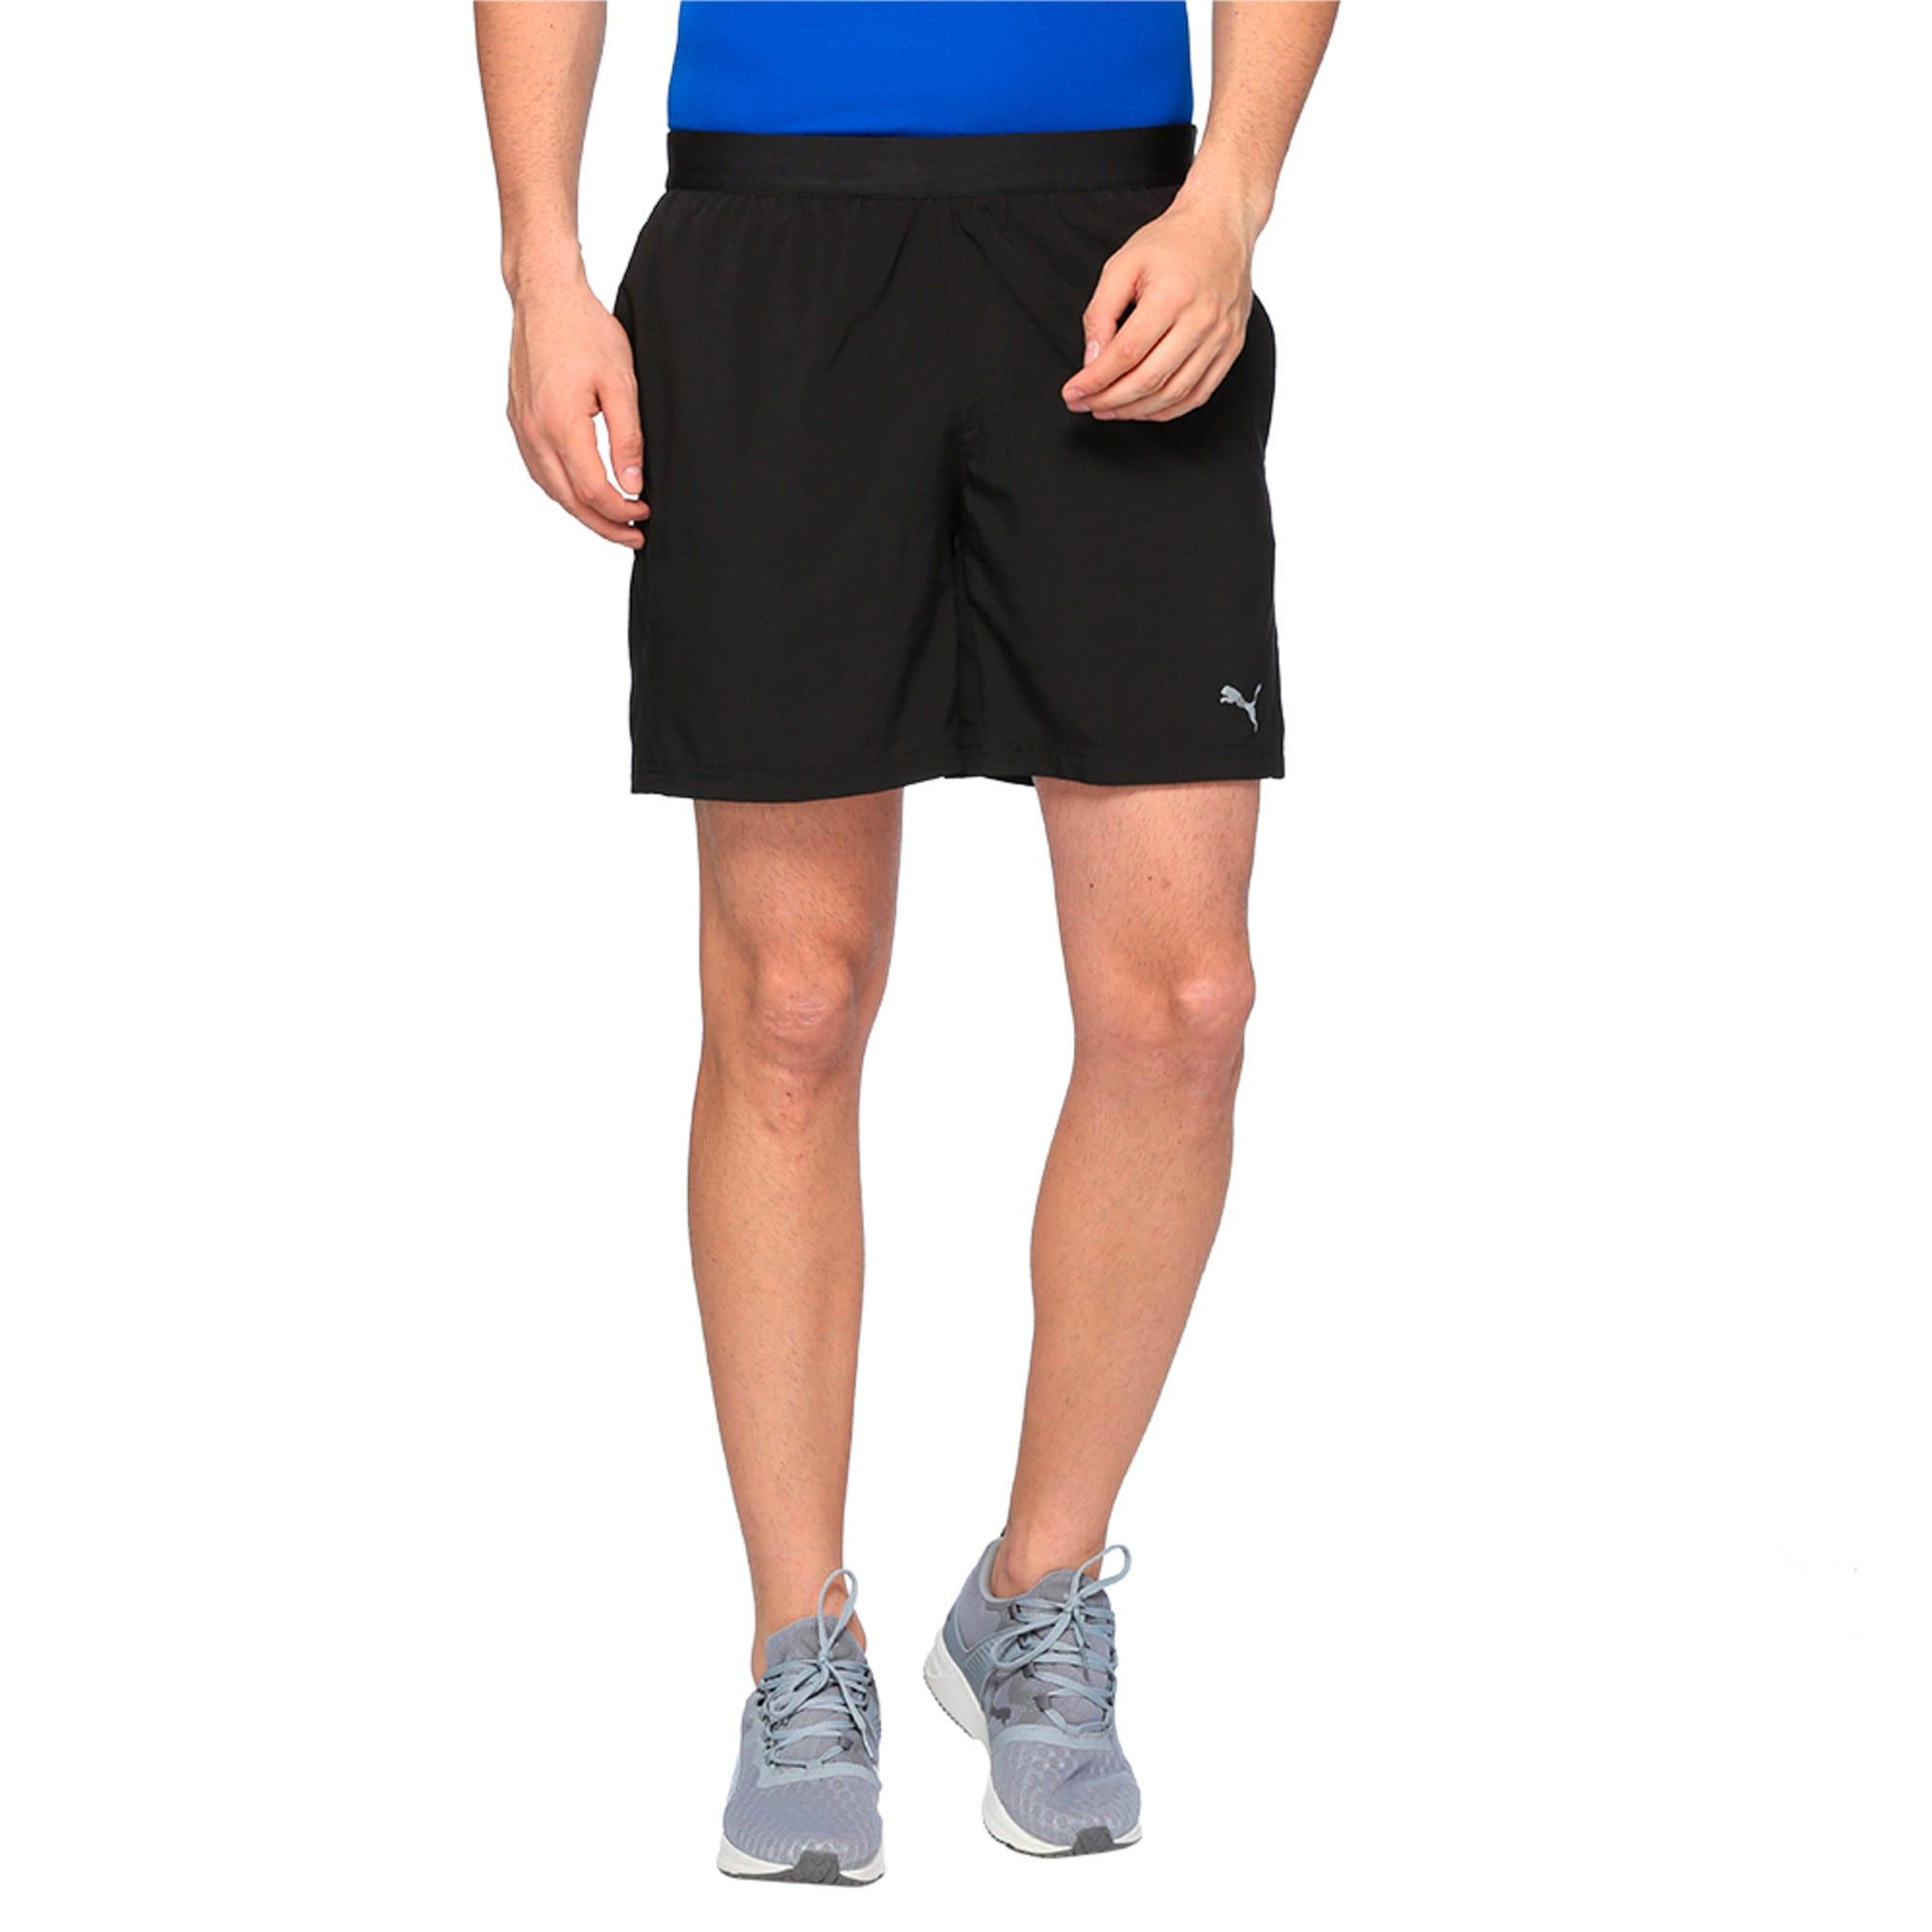 Thumbnail 1 of Running Men's Pace Shorts, Puma Black, medium-IND